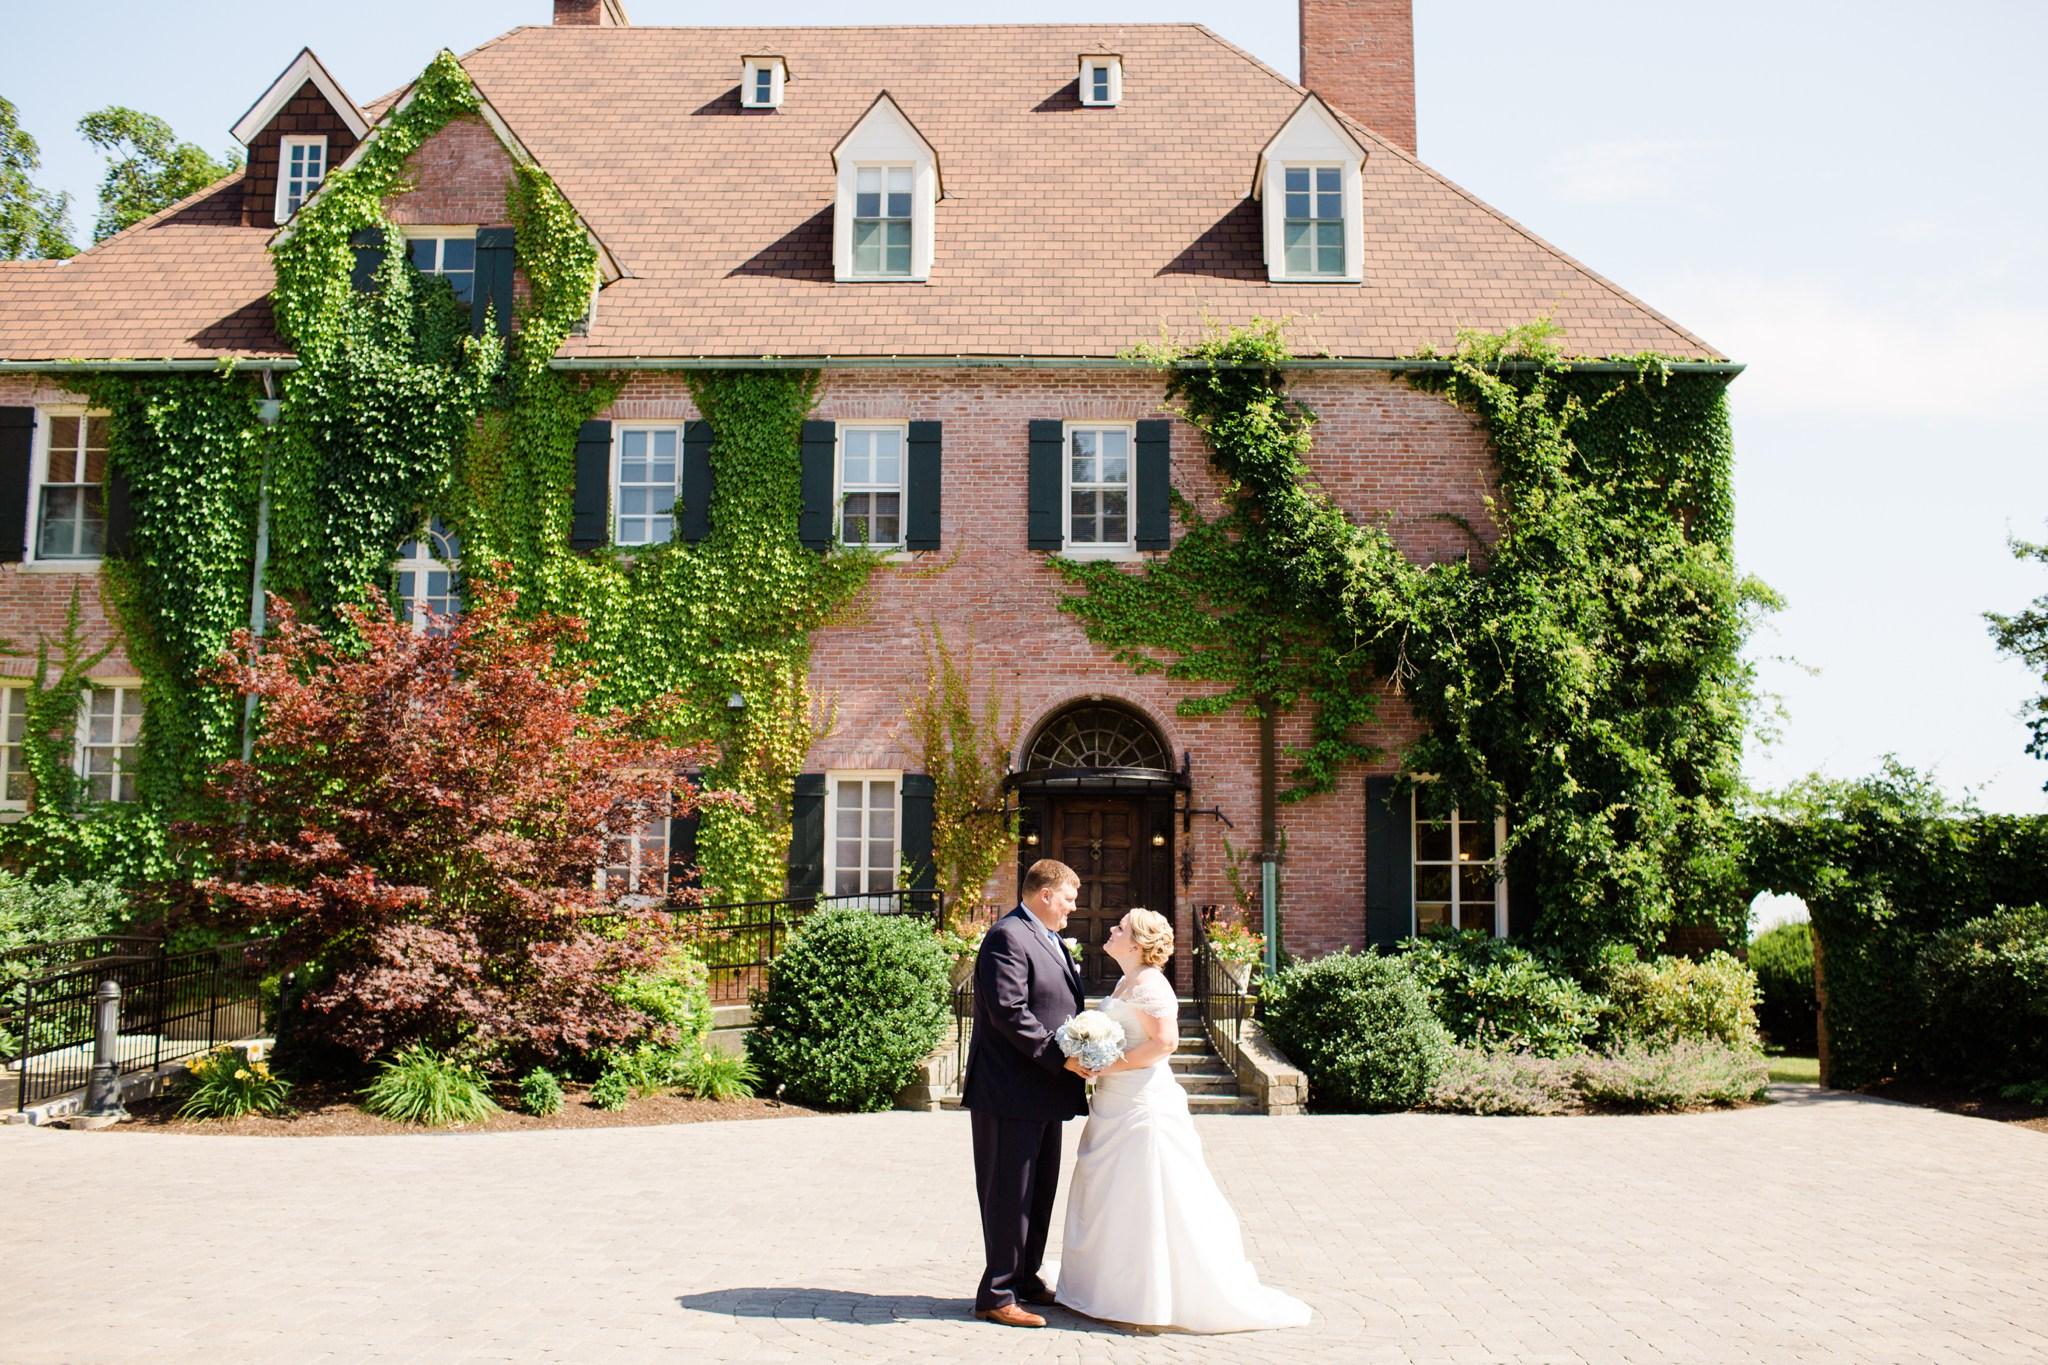 misselwood_endicott_college_wedding_photos_00001.JPG